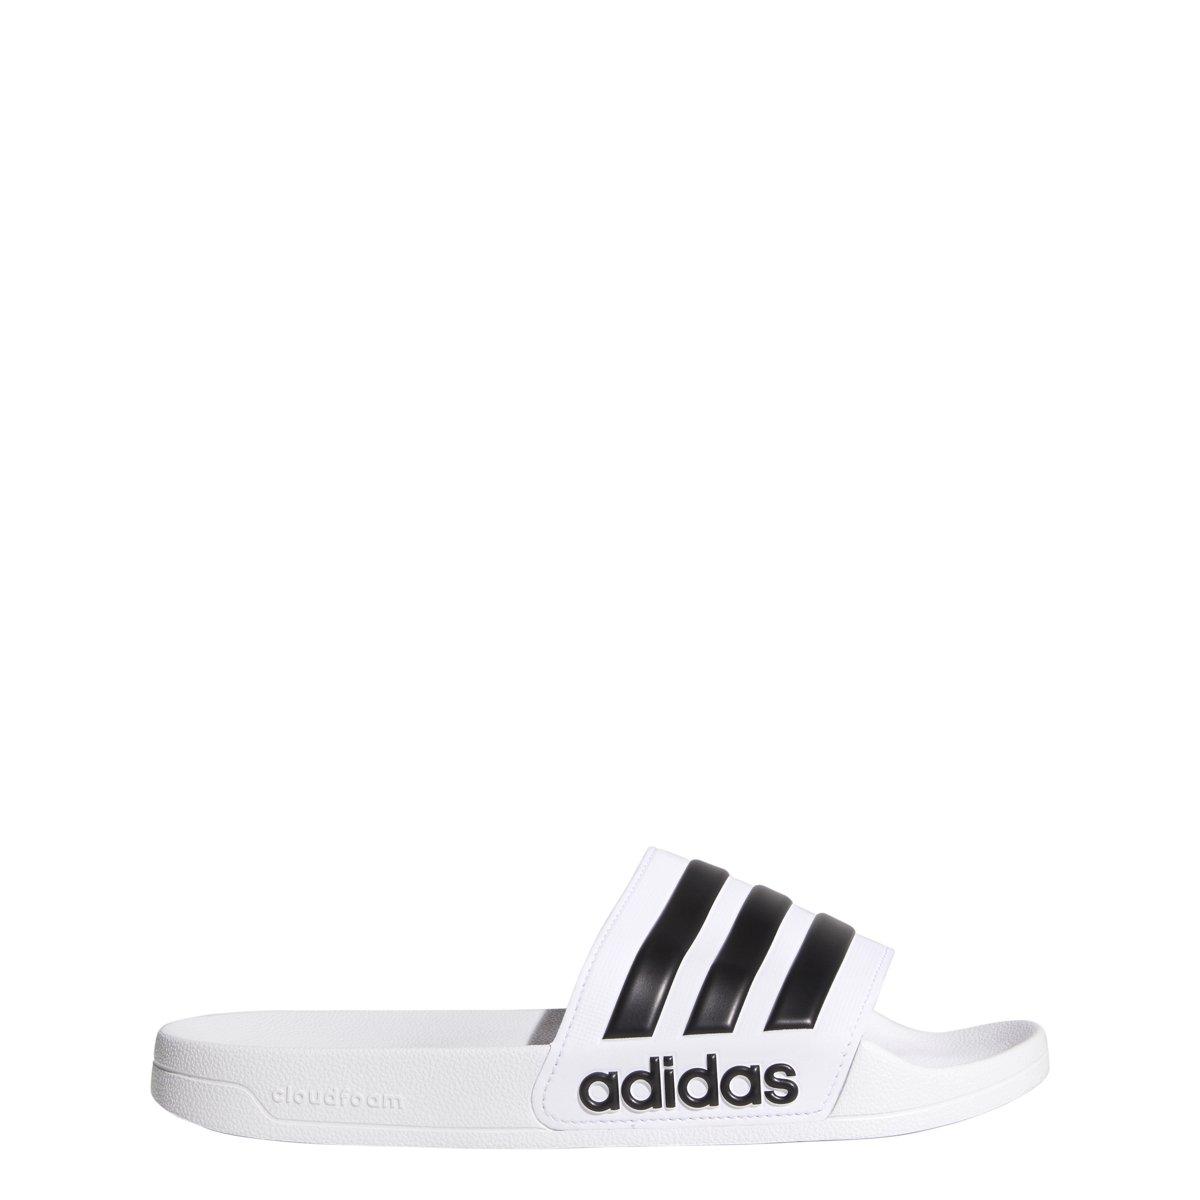 2f26ec5a06b9 adidas Originals Men s Adilette Shower Slide Sandal